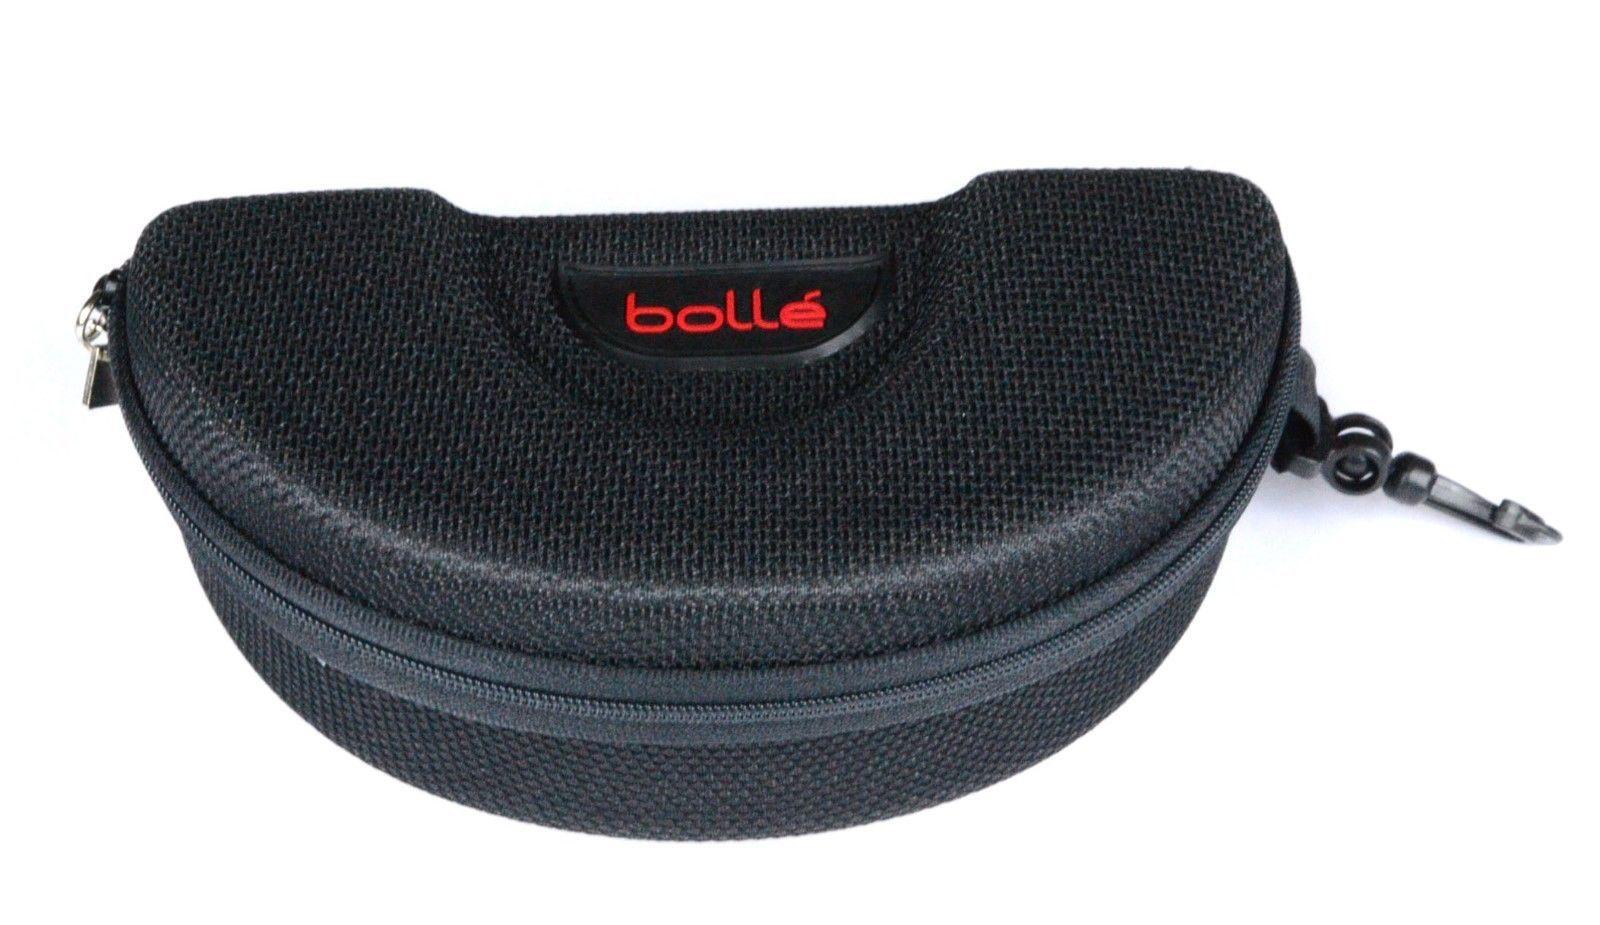 b3e9a8c9f4 Bolle Bolt S Sunglasses - 12013- Matte Black w  Competivision Gun Anti Fog  Lens